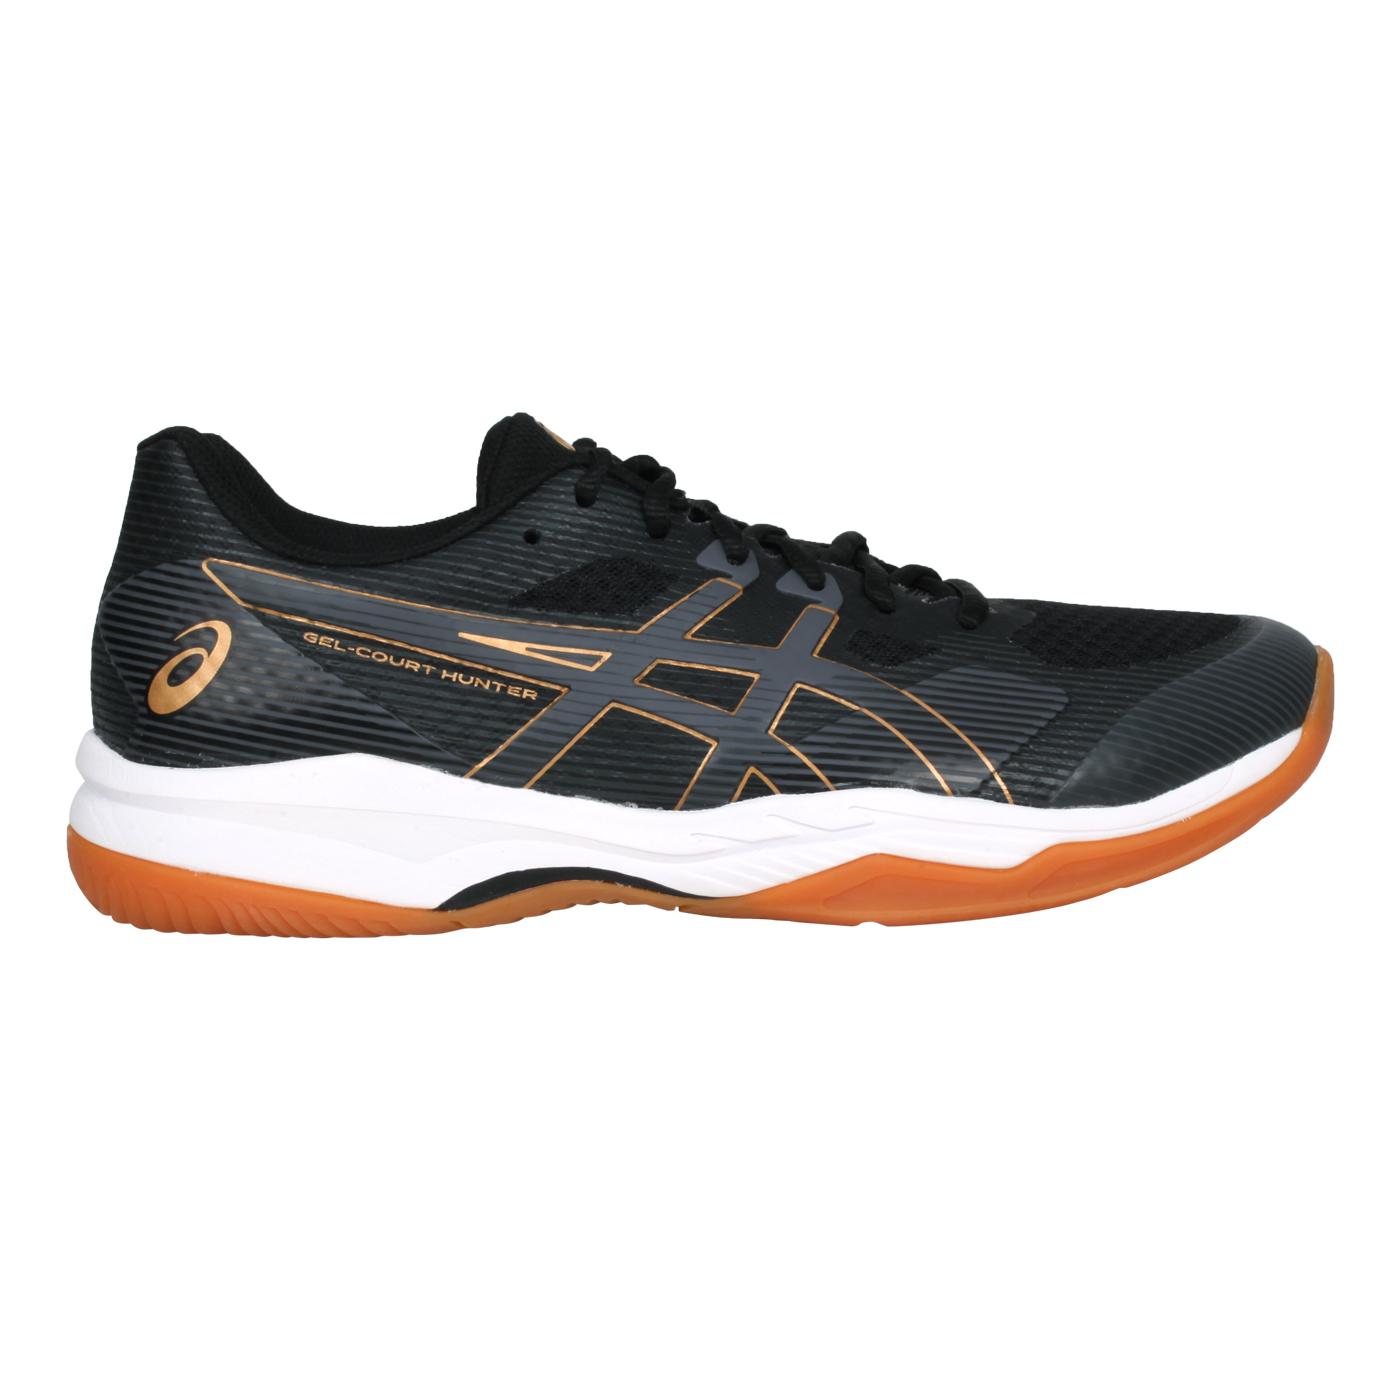 ASICS 男款羽球鞋   @GEL-COURT HUNTER 2@1071A059-001